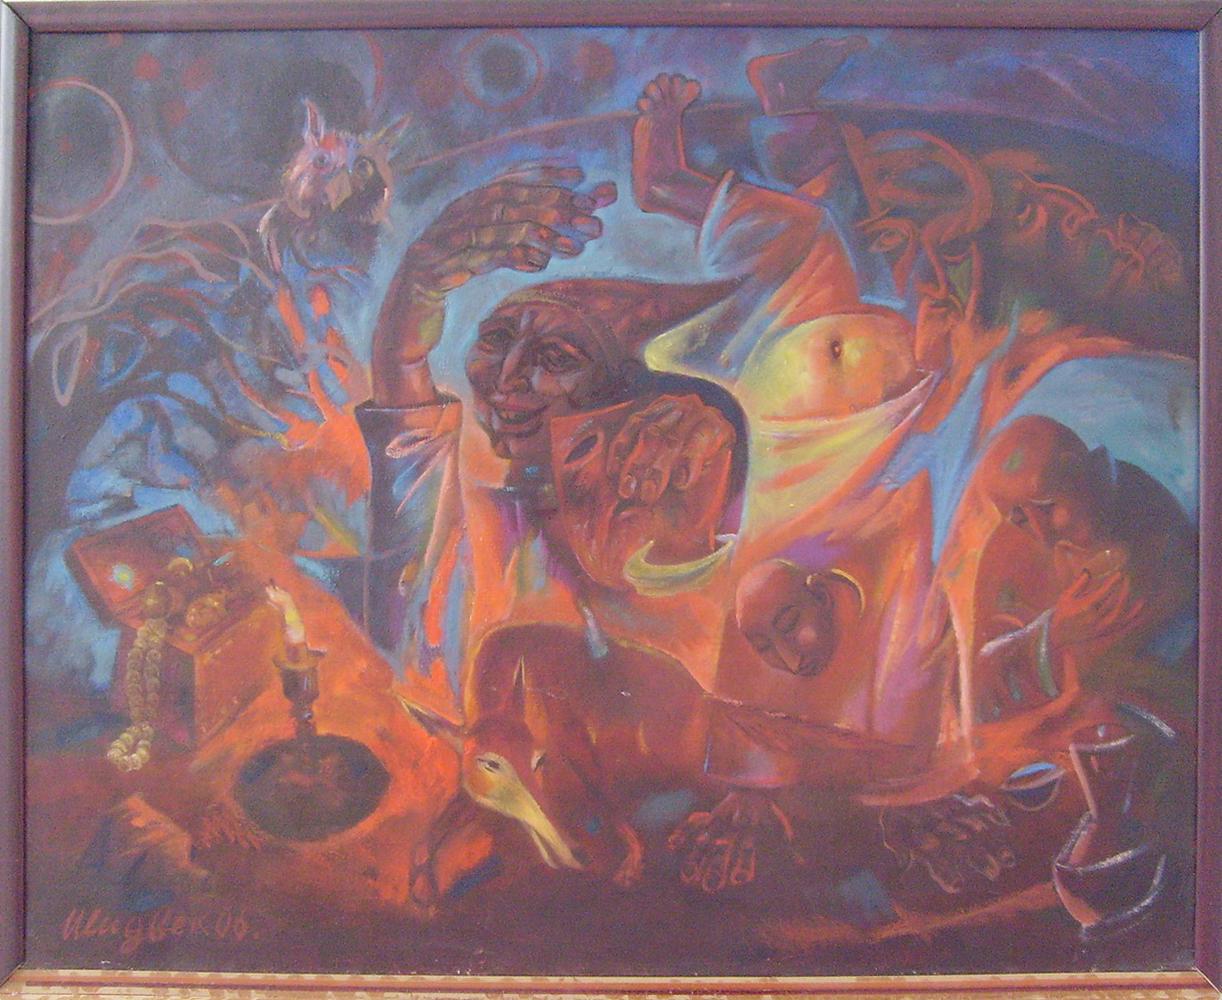 Болтабаев Улугбек. «Индийский клоун» по мотивам поэмы «Хайратул аброр» А.Навои